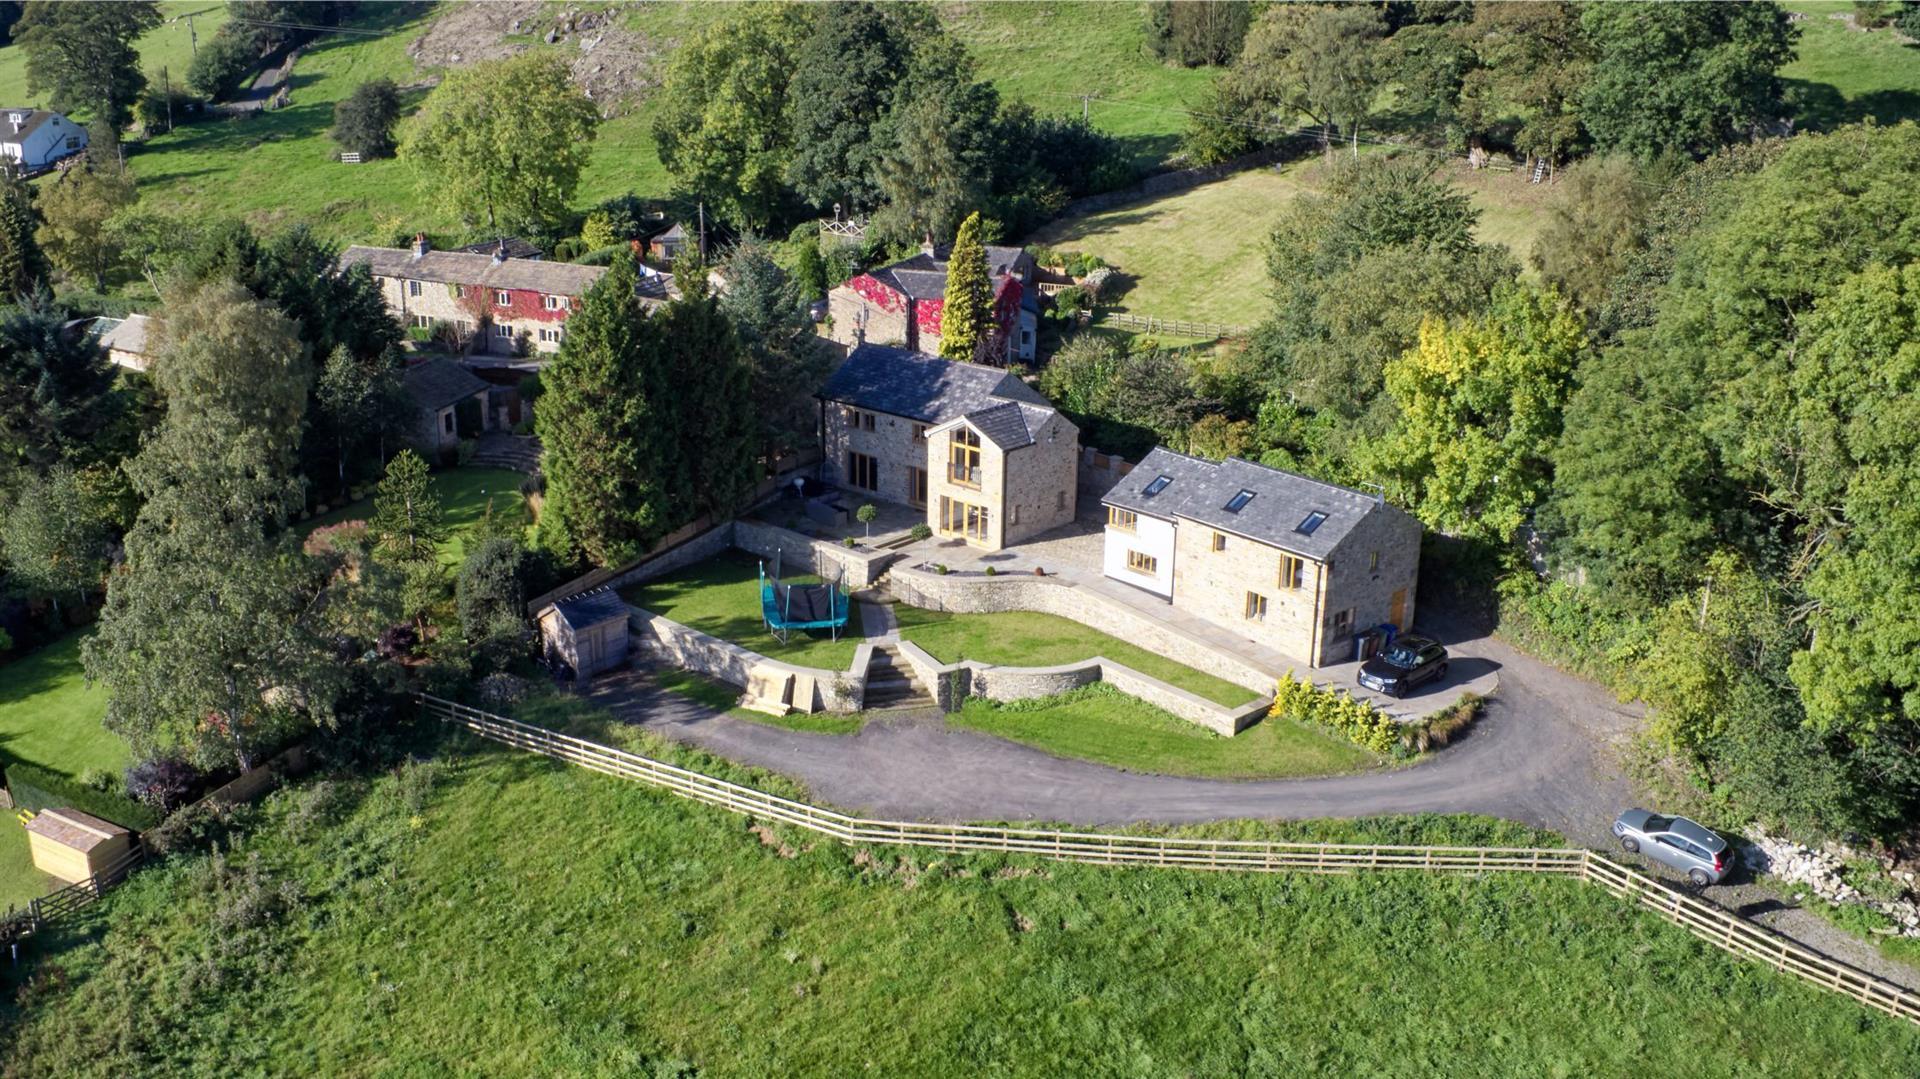 4 Bedroom Detached House For Sale - Farmhouse 1